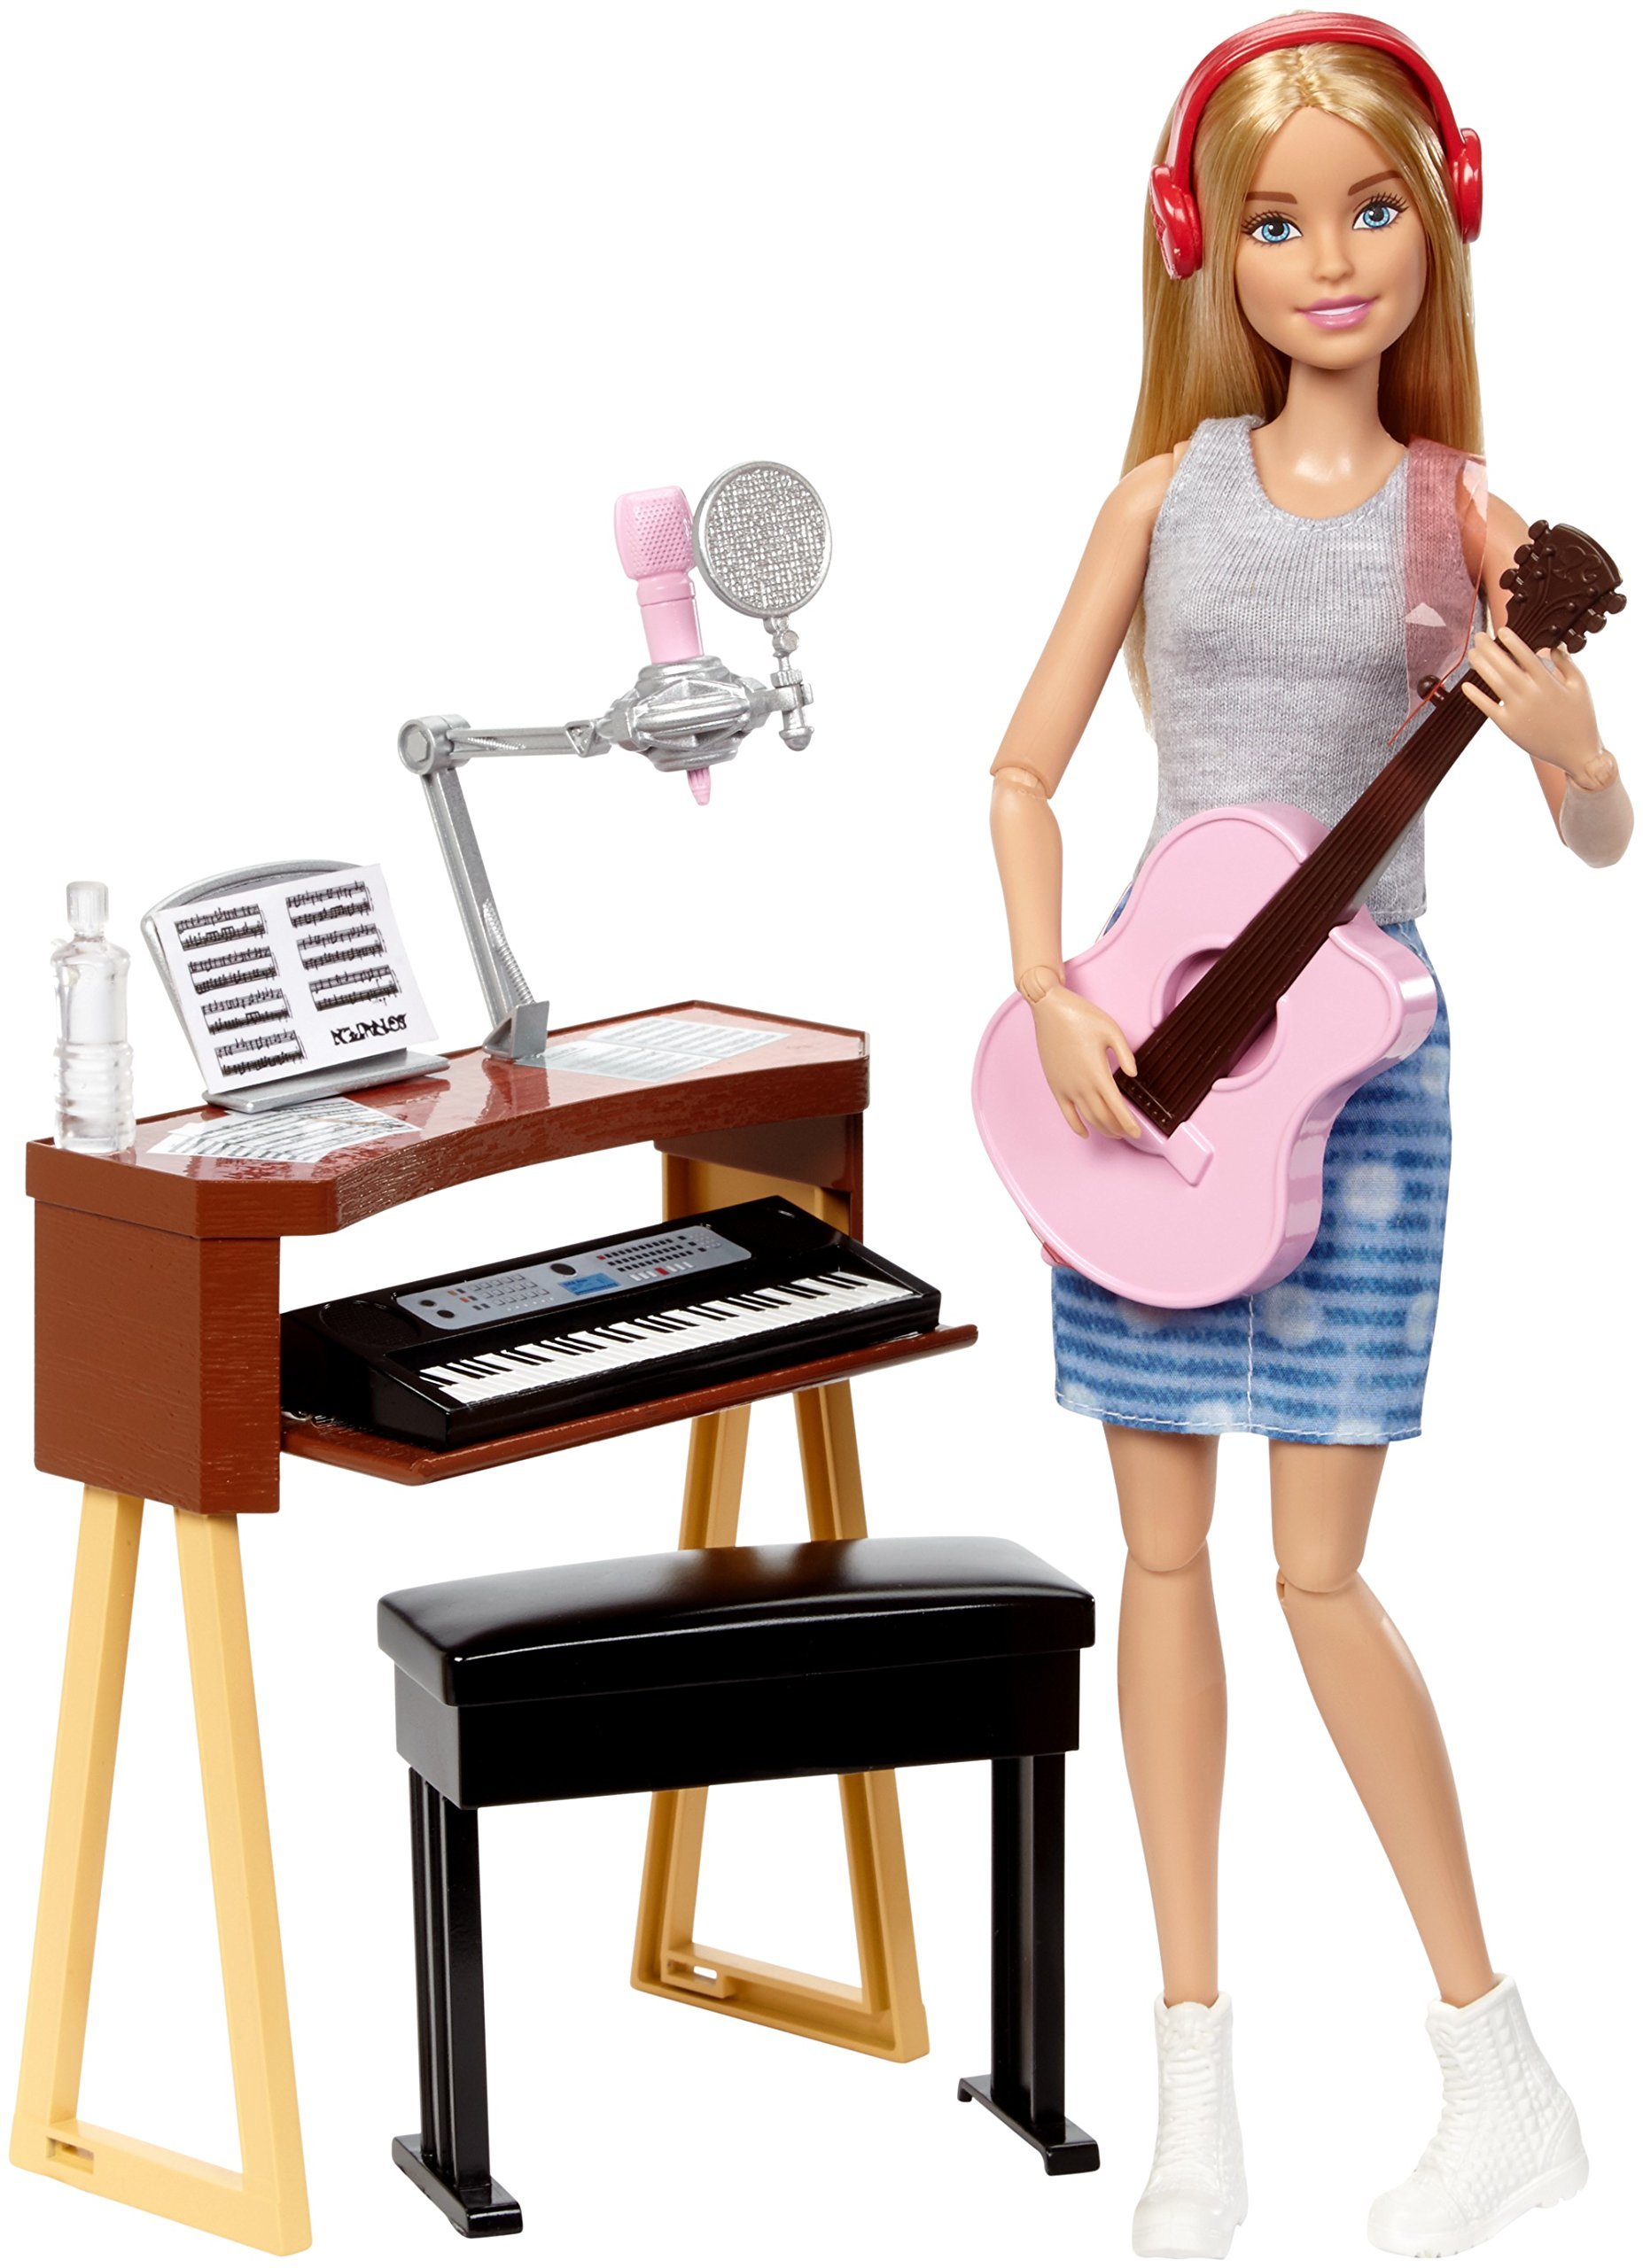 Barbie Musician Doll & Playset, Blonde